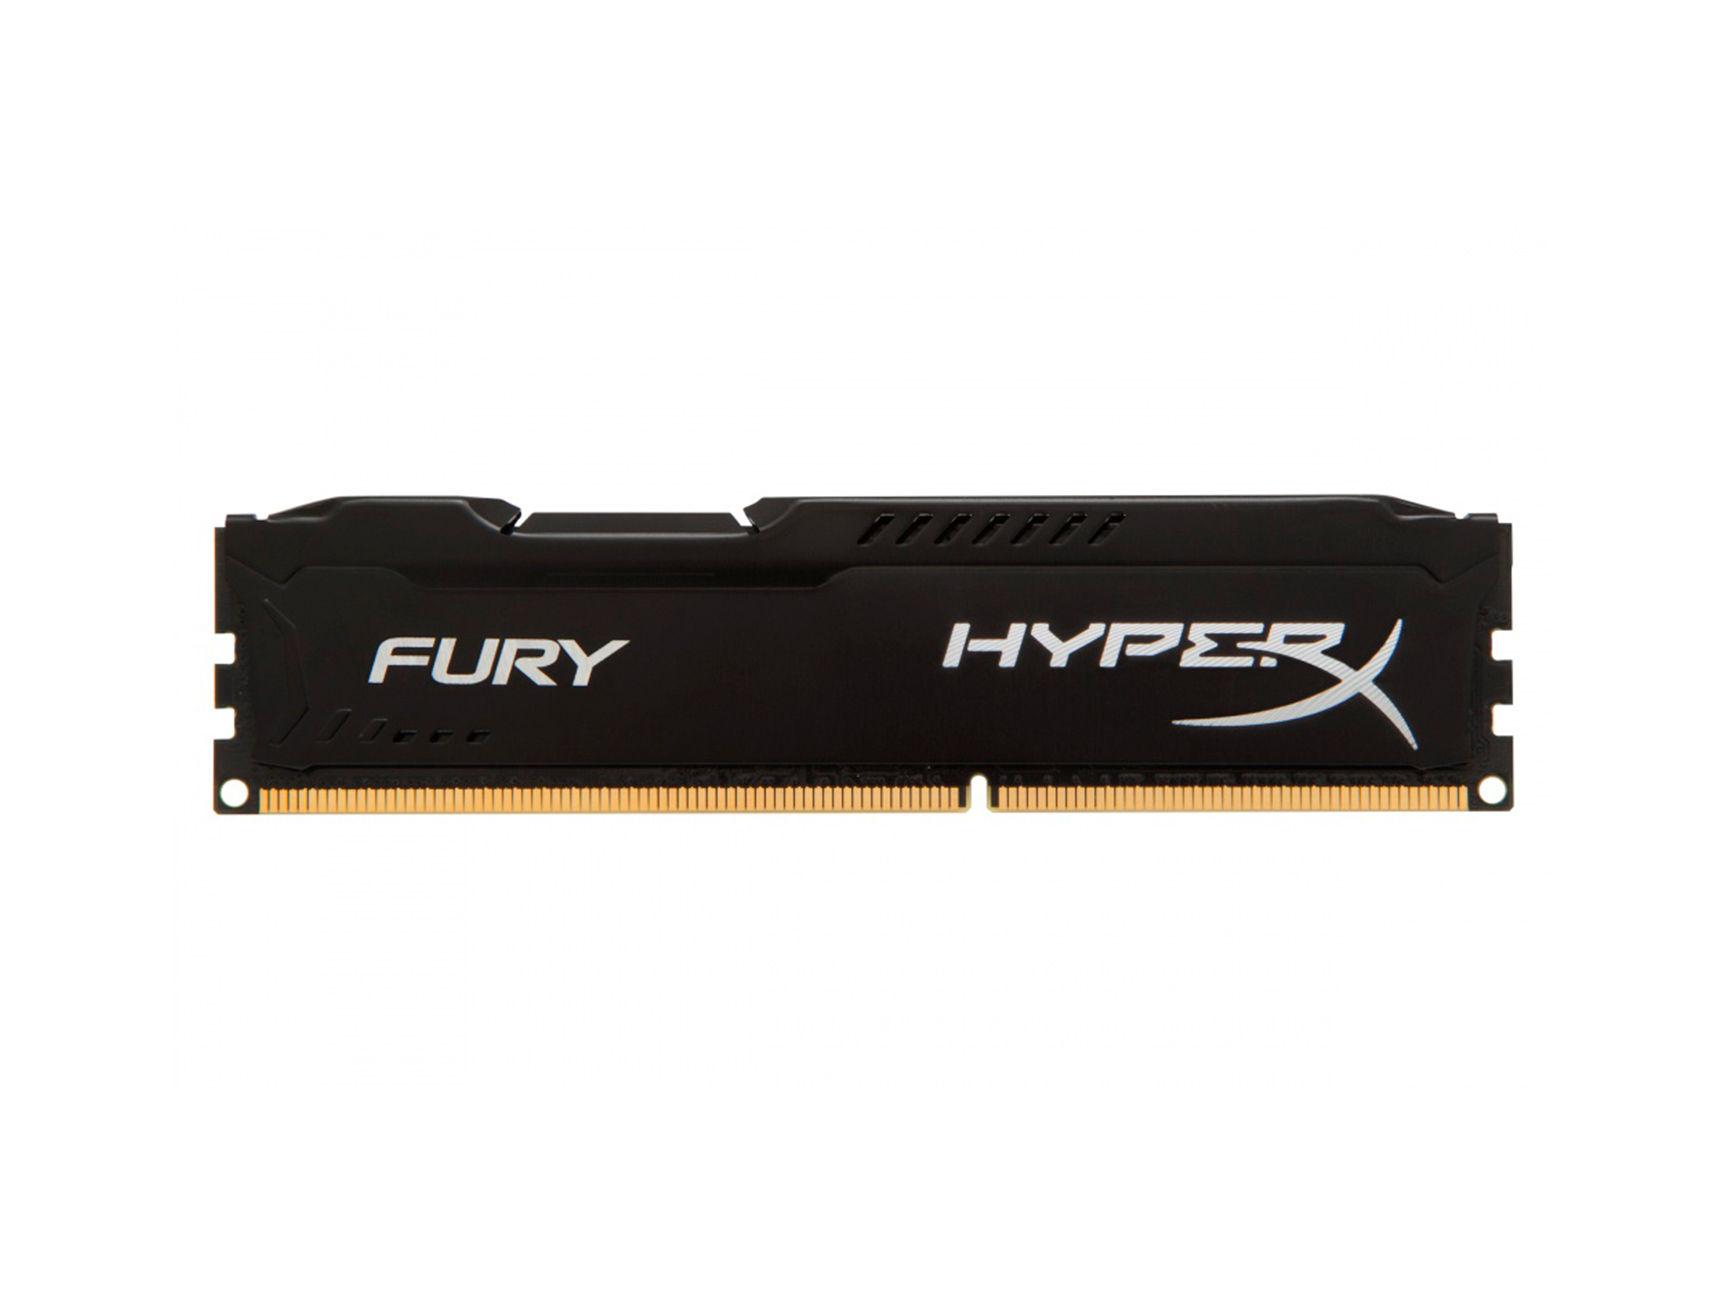 MEM. RAM HYPERX FURY DDR3 8GB/1600 ( HX316C10FB/8 ) NEGRO